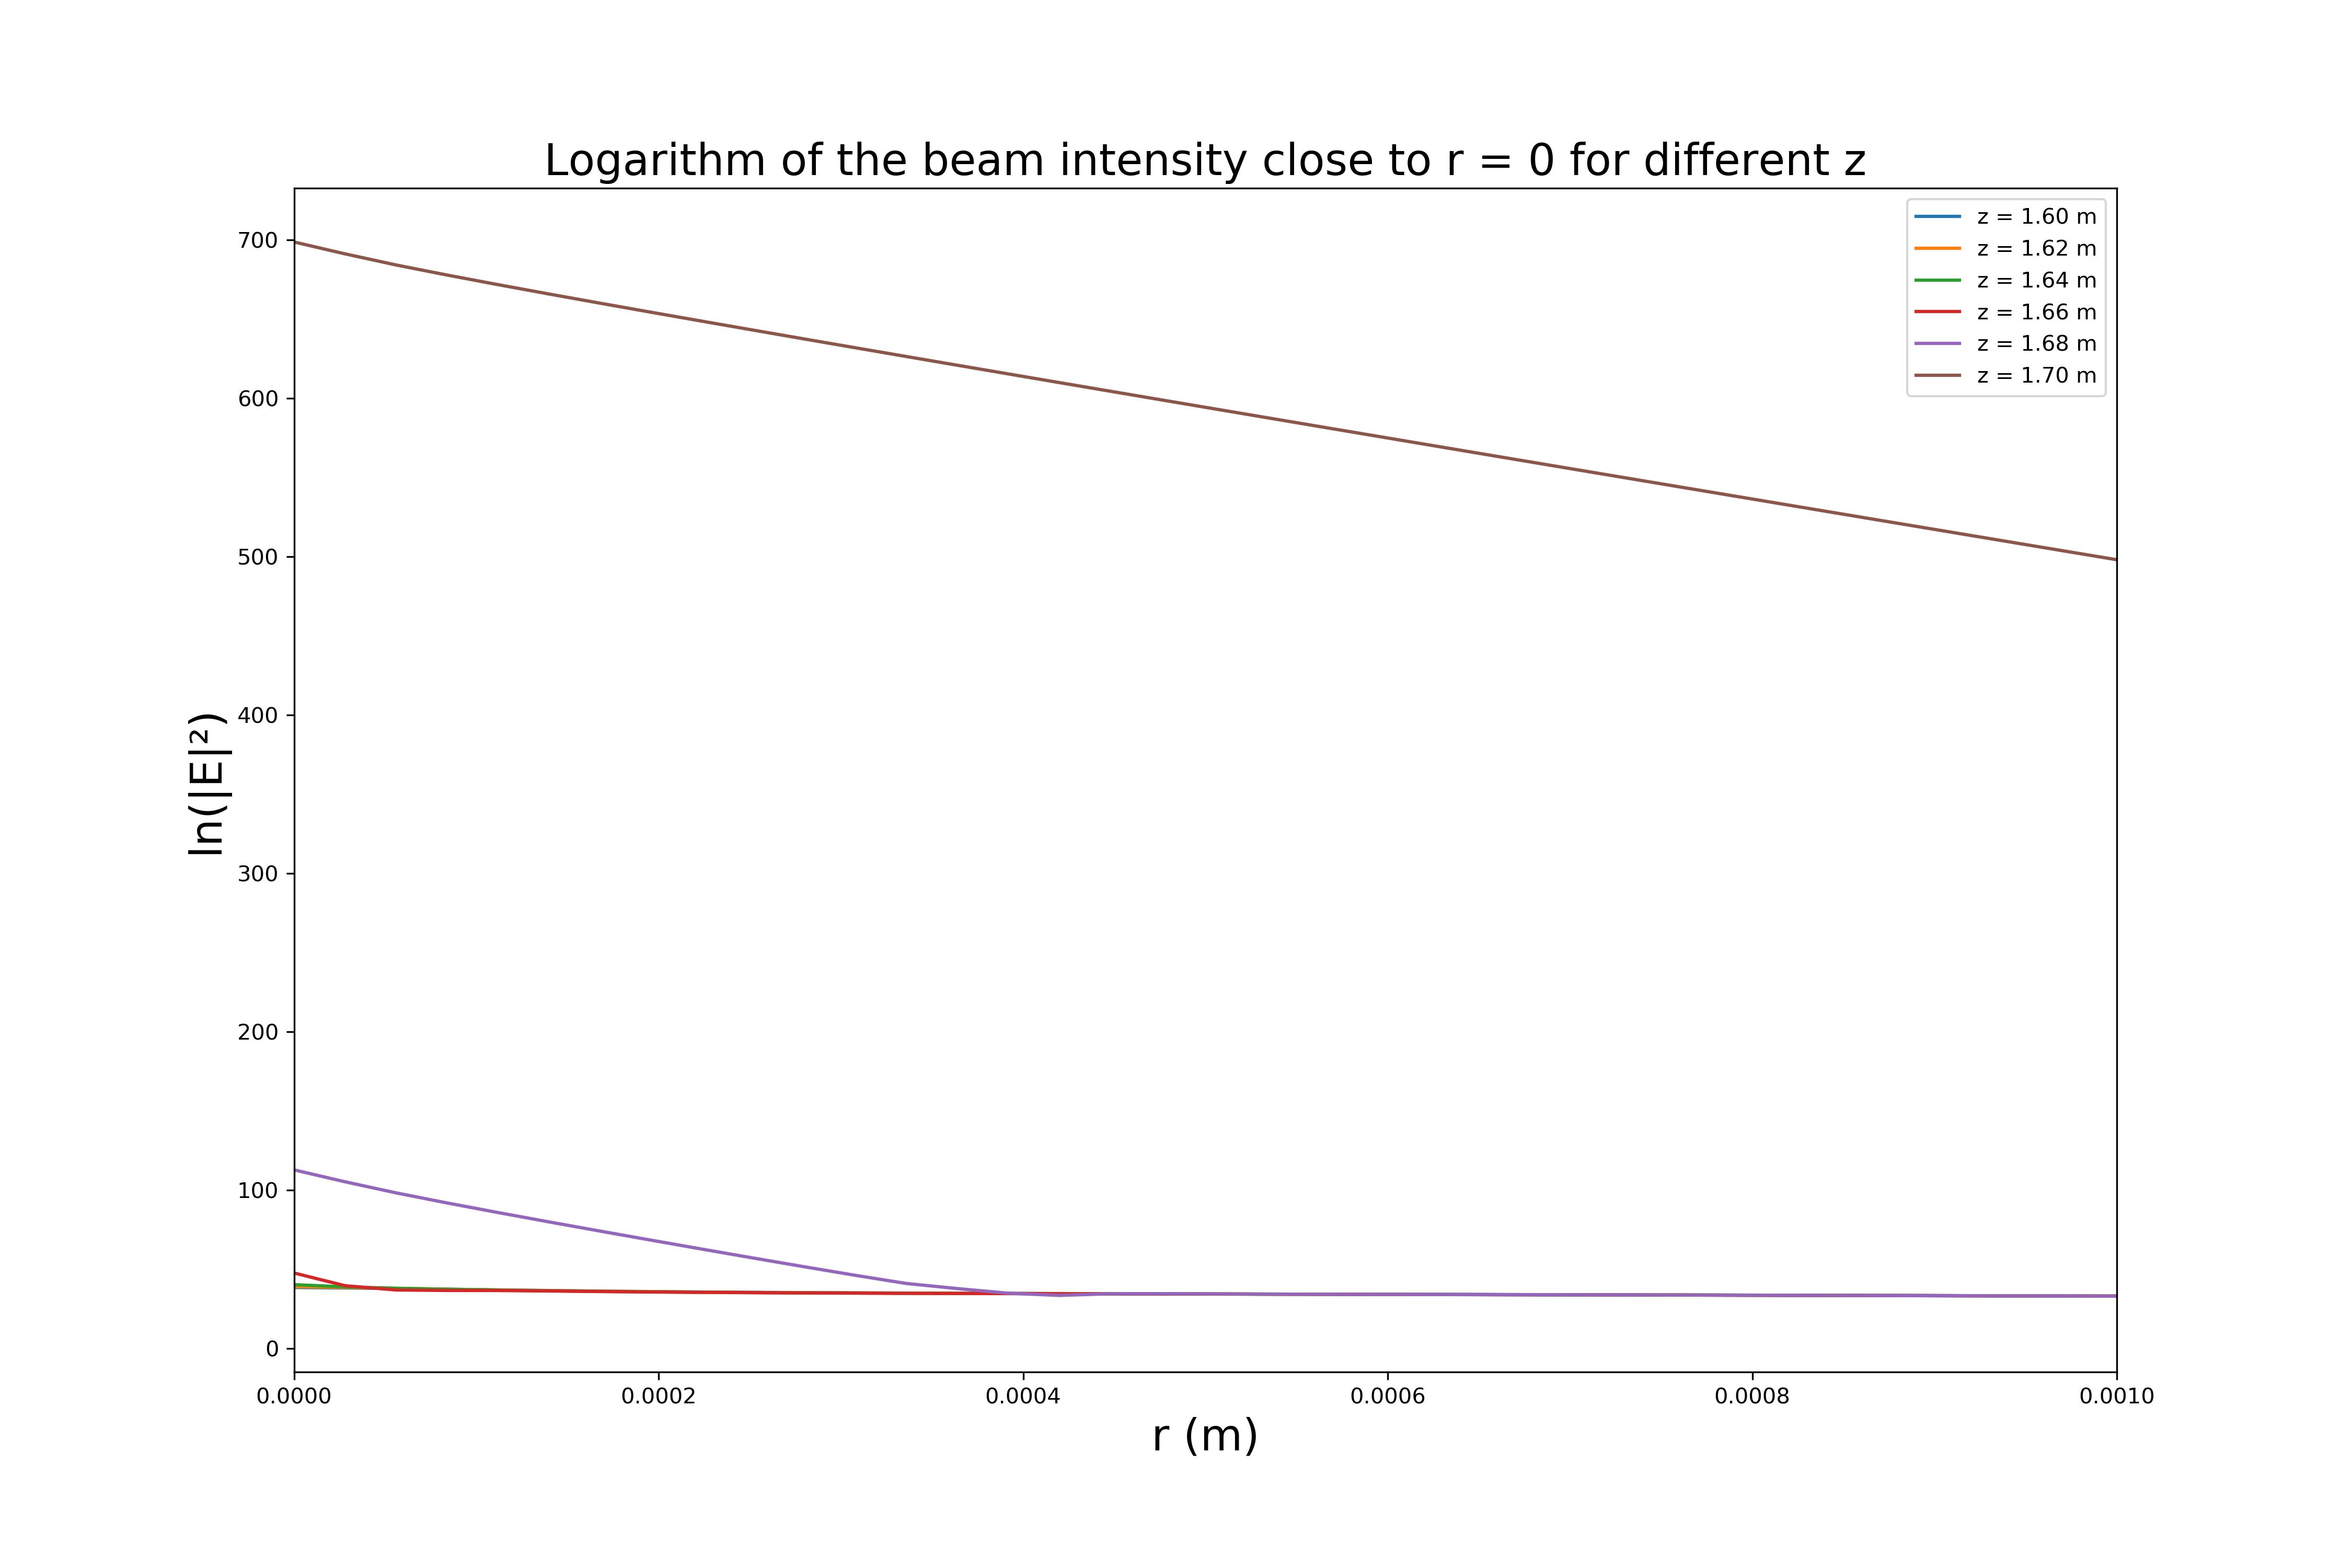 figures/HSCN/energy_divergence.png